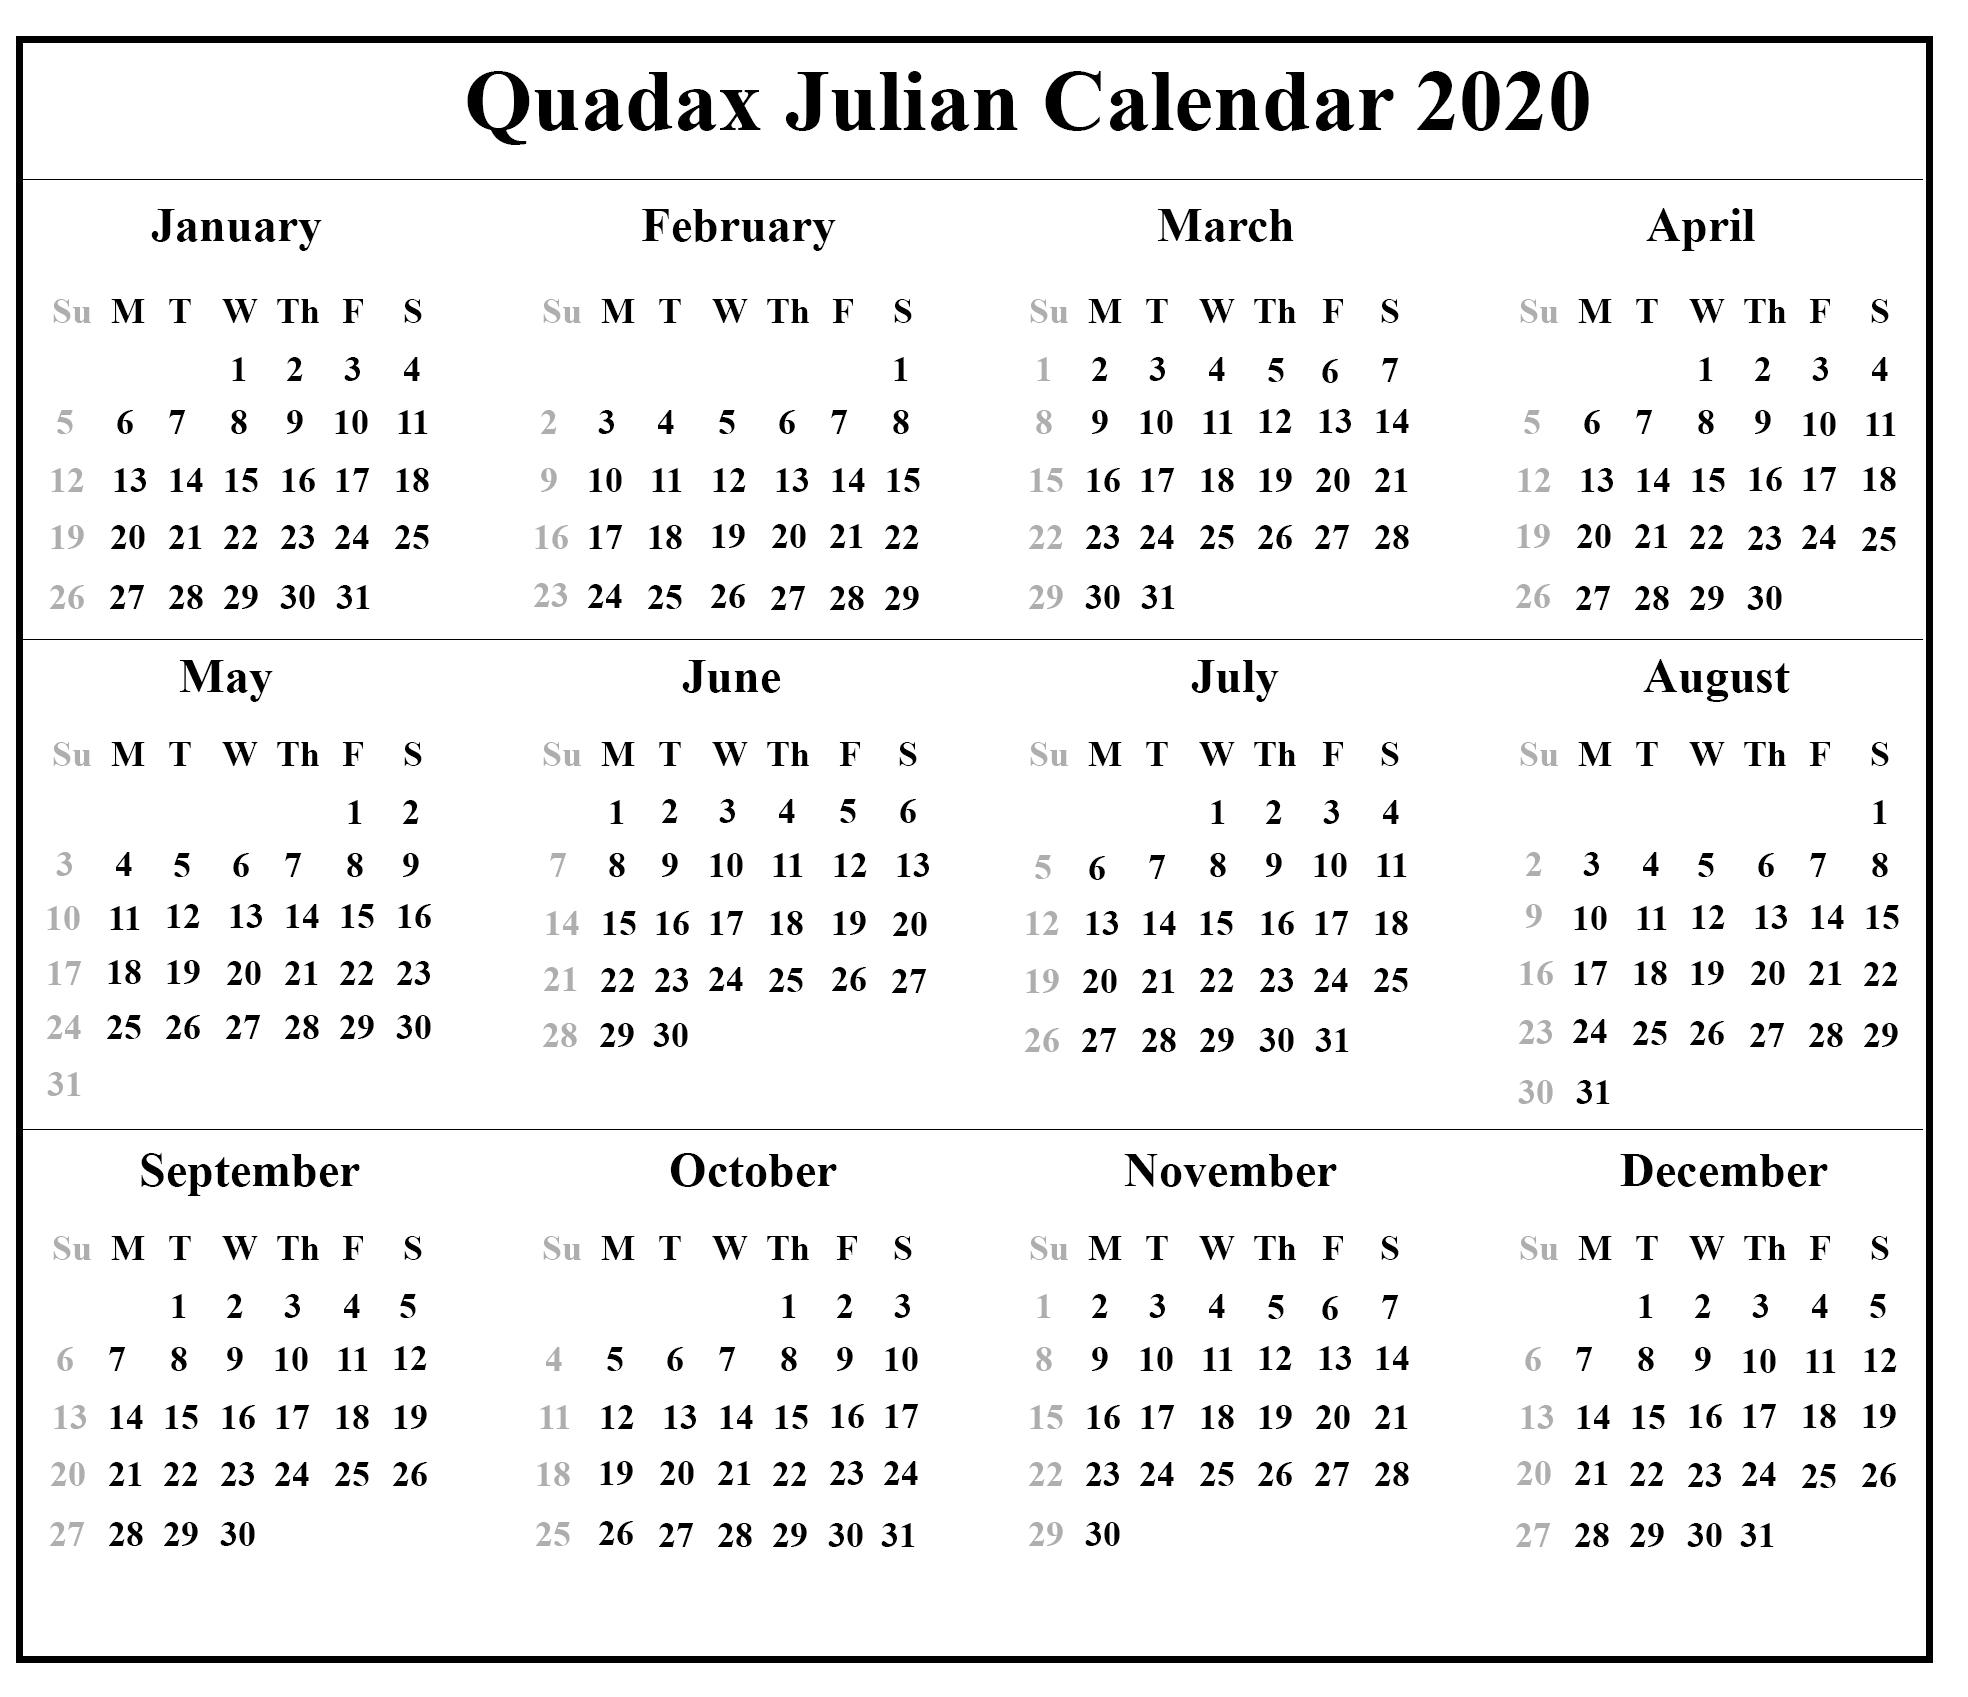 2020 Julian Calendar Quadax Pdf   Free Printable Calendar